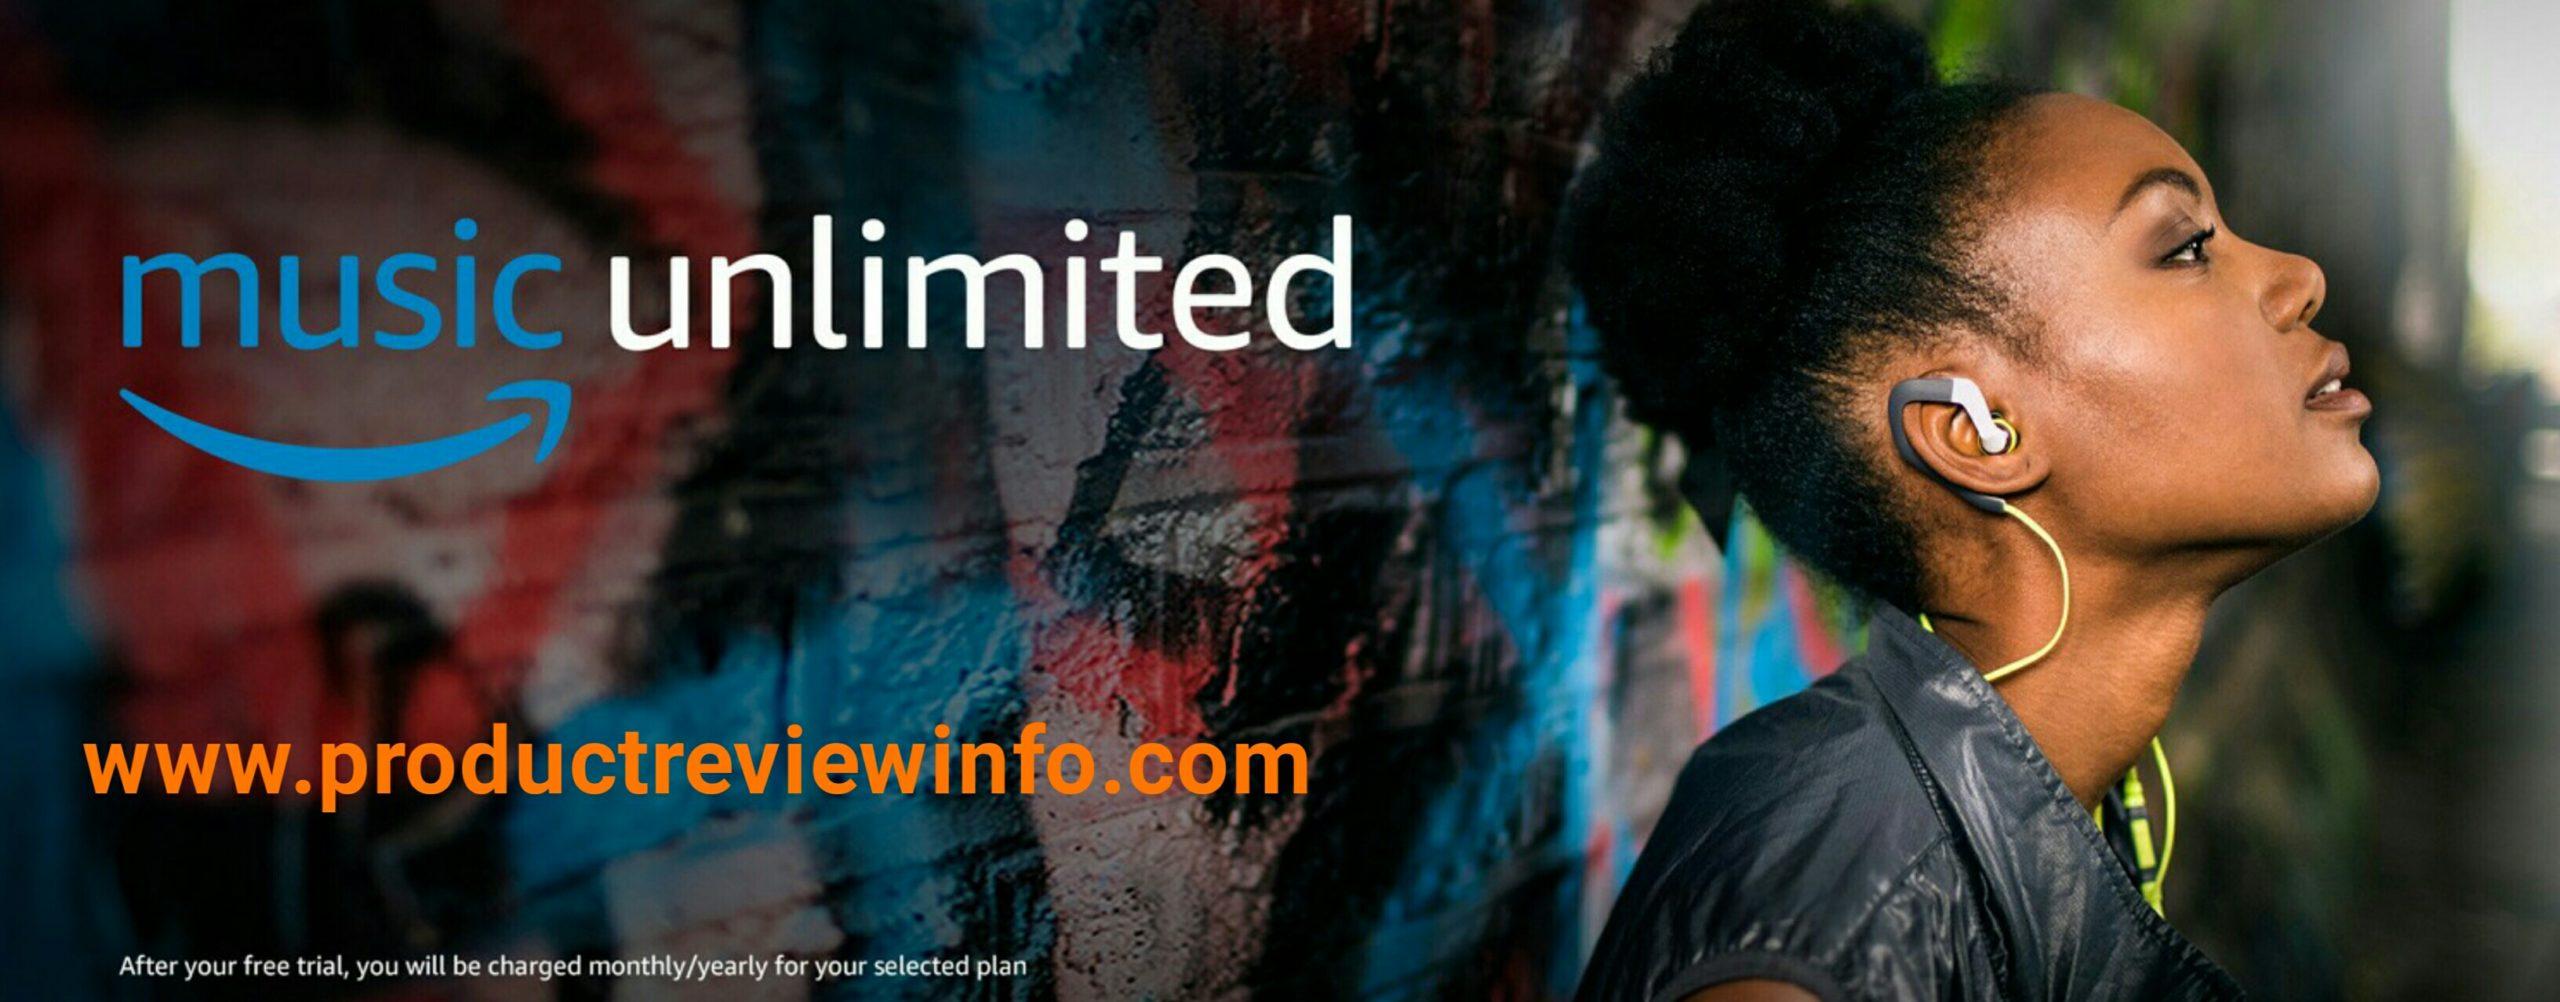 Amazon Music Unlimited Membership Full Review